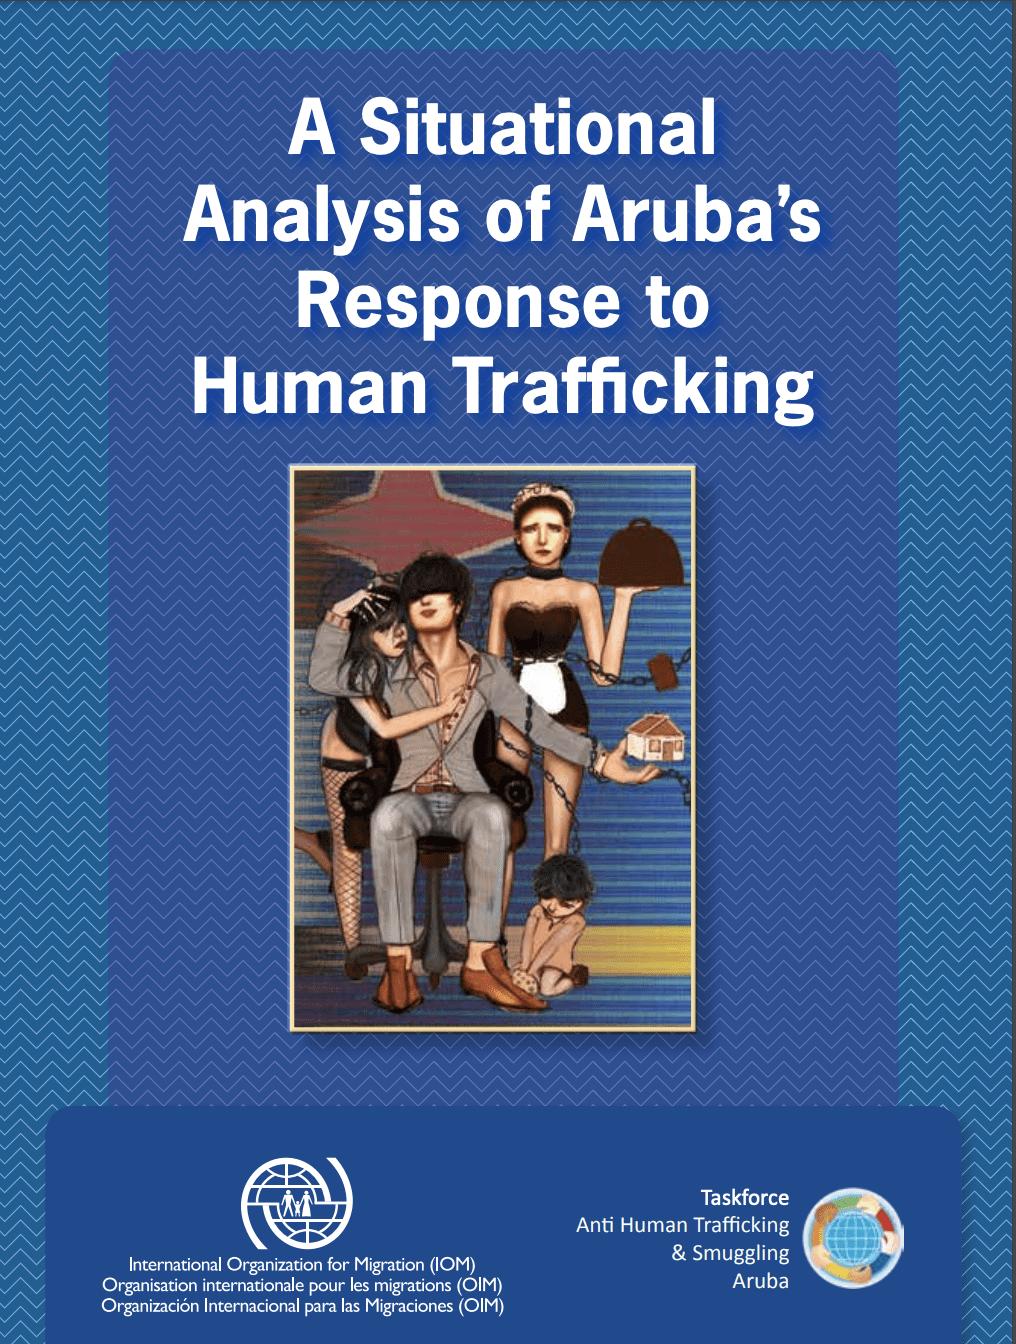 A Situational Analysis of Aruba's Response to Human Trafficking